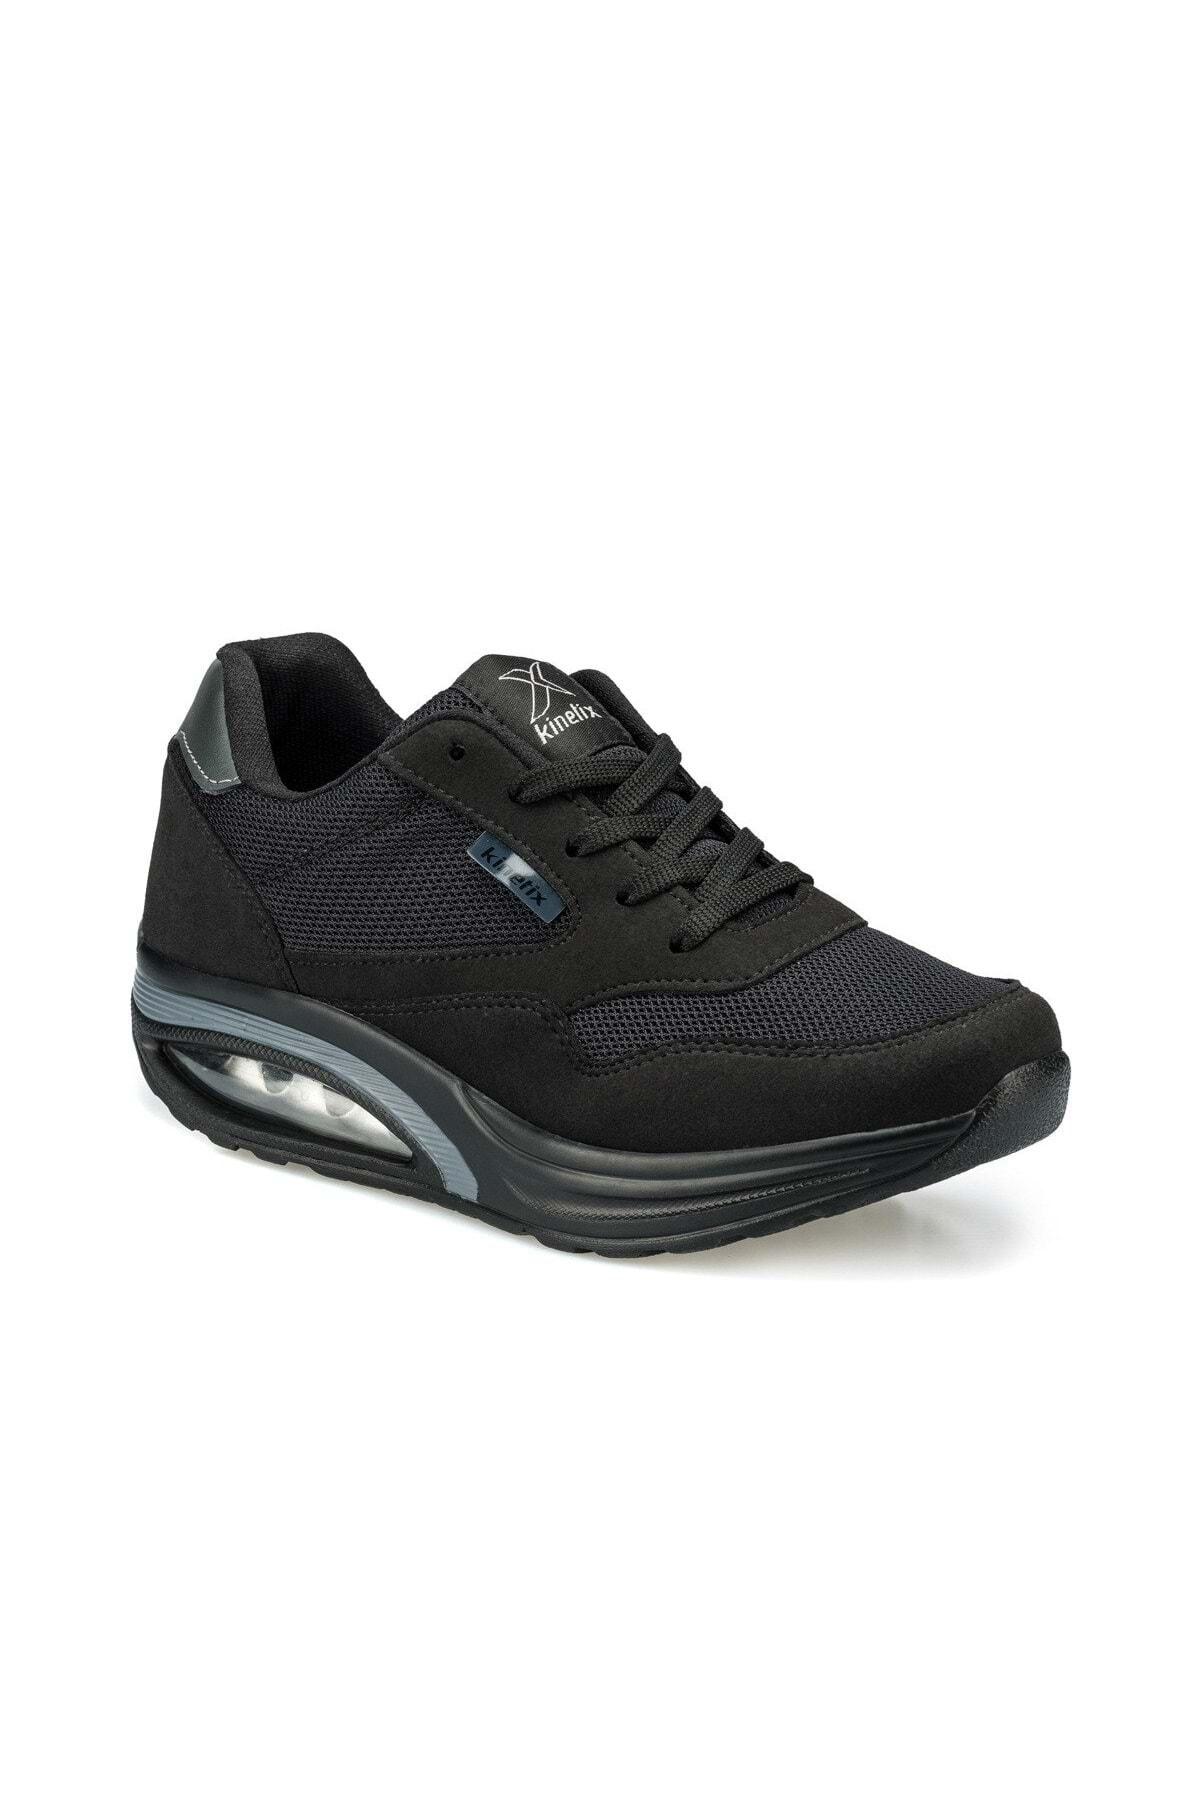 Aneta Tx W 1fx 100781880 Siyah-k Gri Kadın Spor Ayakkabı - - Siyah - 38